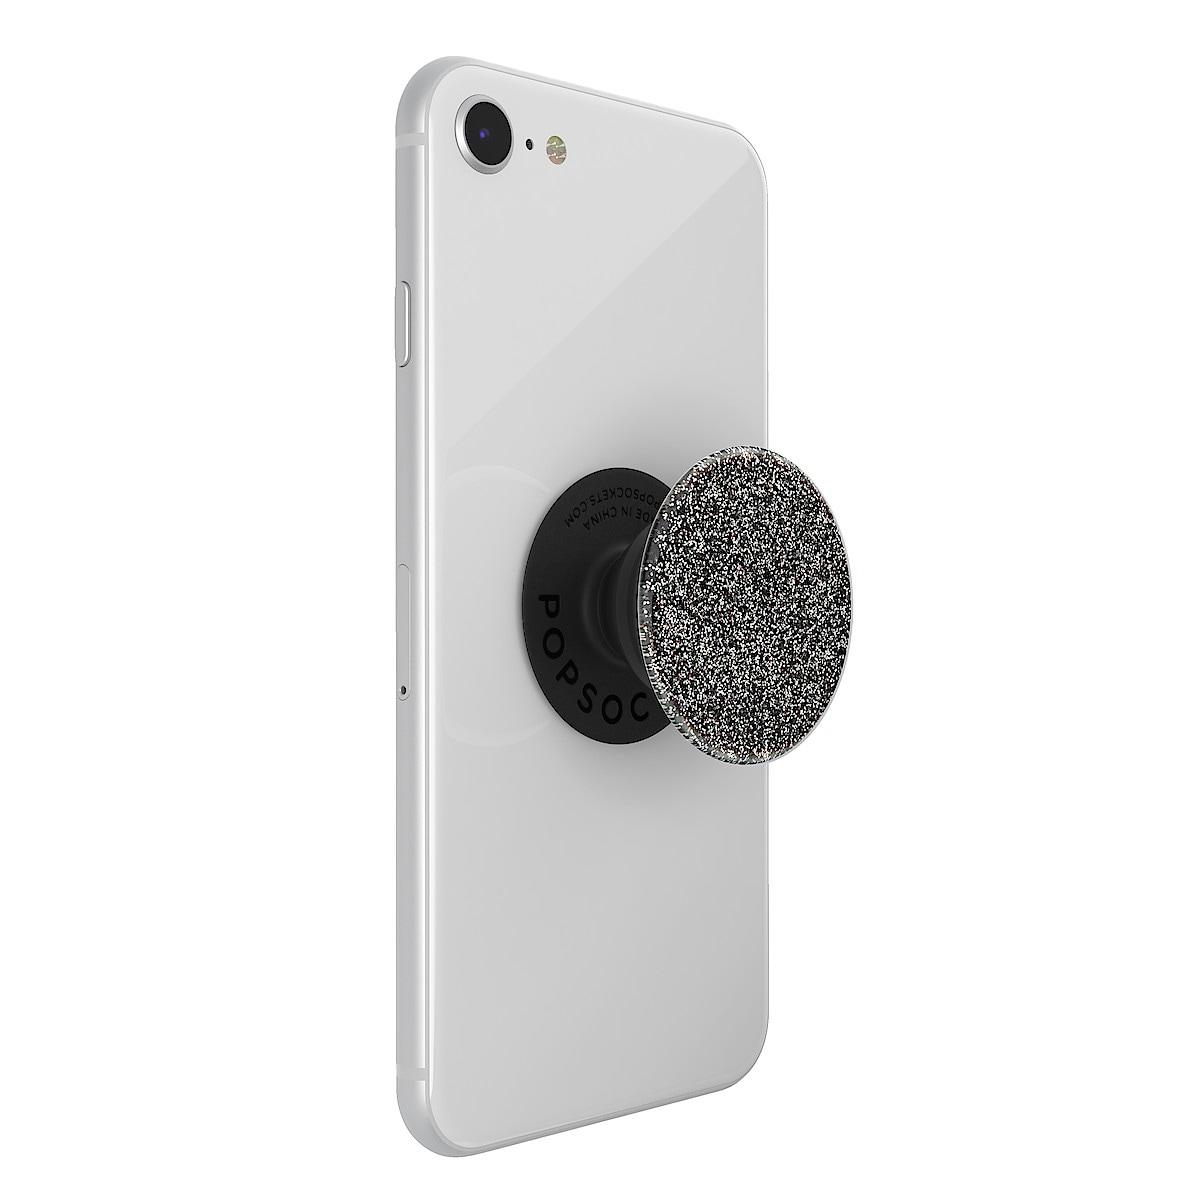 Puhelinpidike, PopSockets Grip Premium